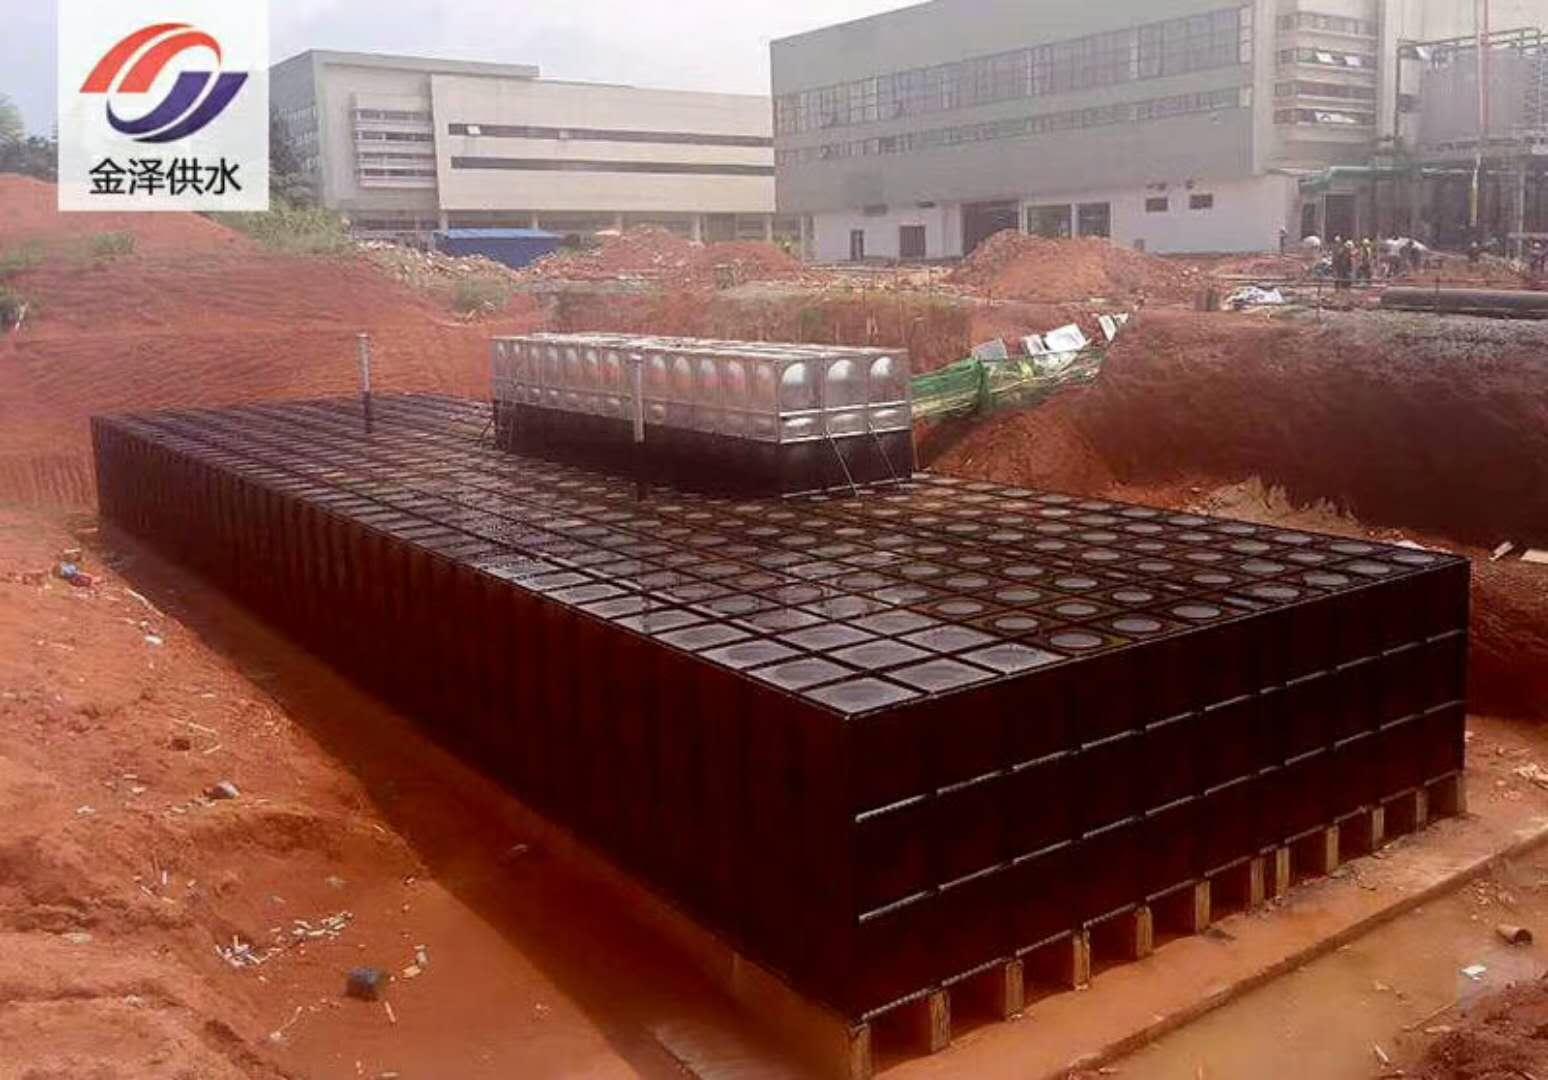 <strong>宁夏银川地埋式消防加压一体化供水设备造价</strong>